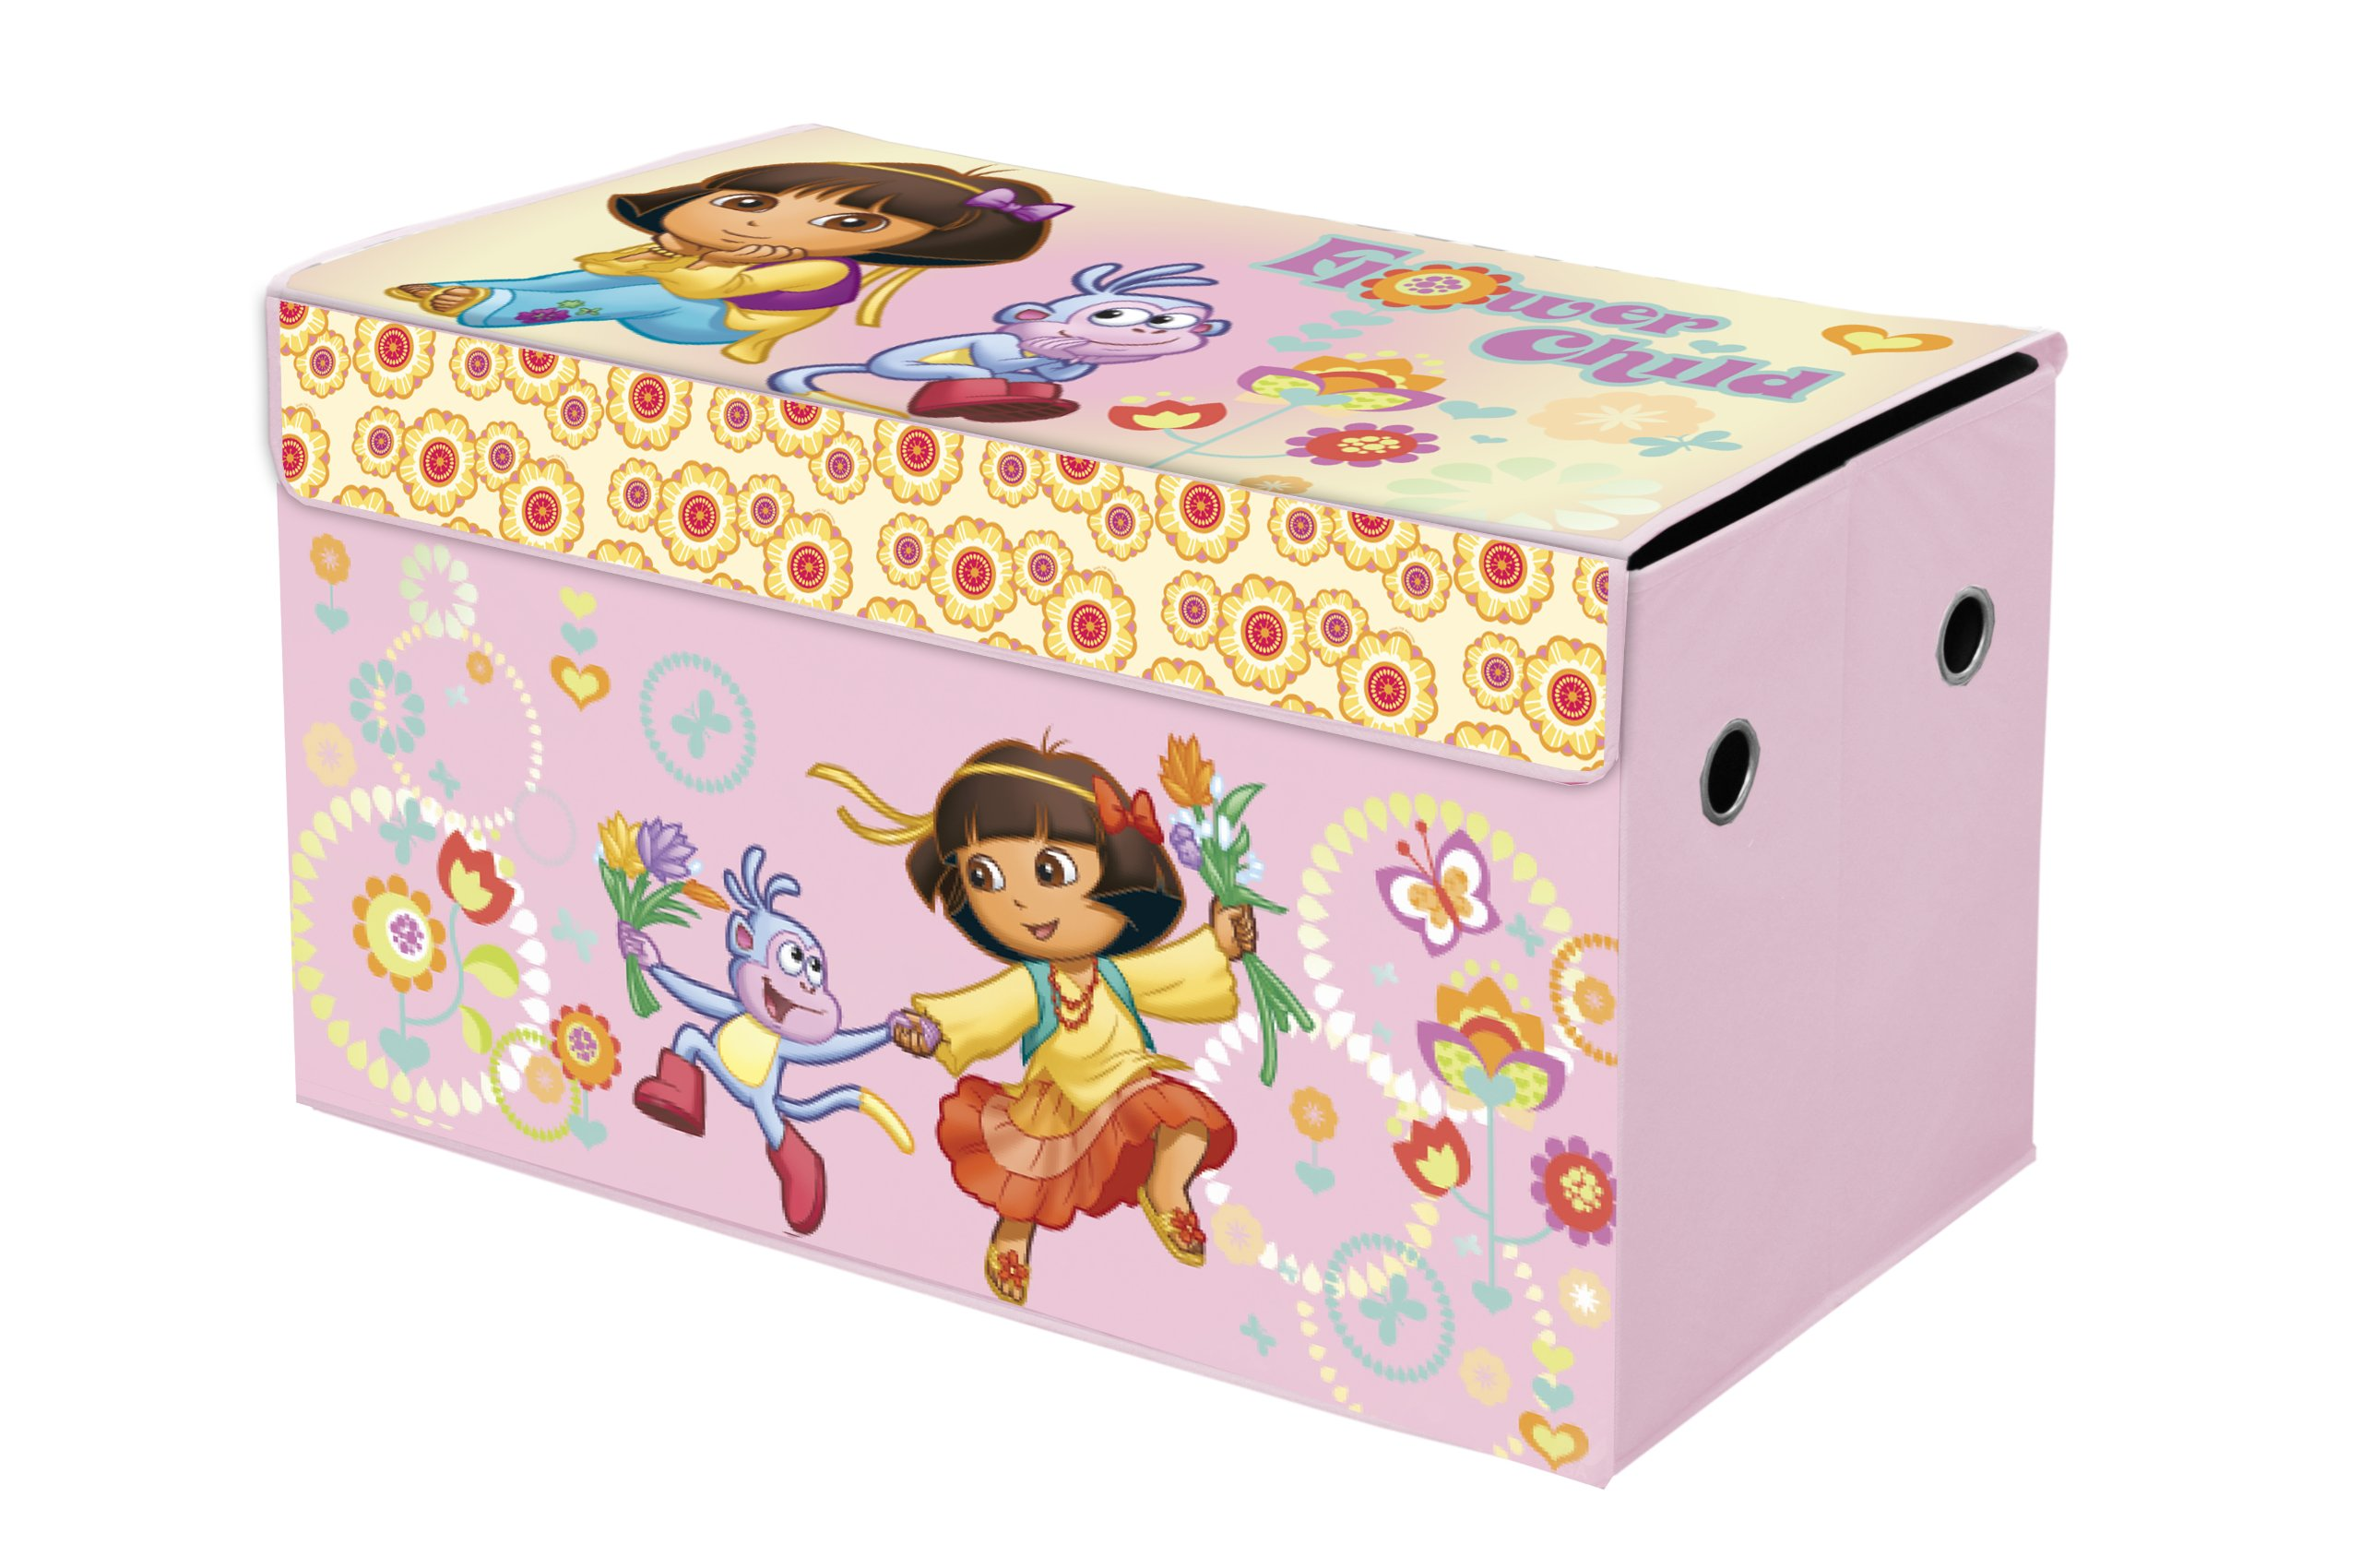 Disney Collapsible Storage Trunk Toy Box Organizer Chest: Amazon.com: Delta Children Fabric Toy Box, Nick Jr. Dora